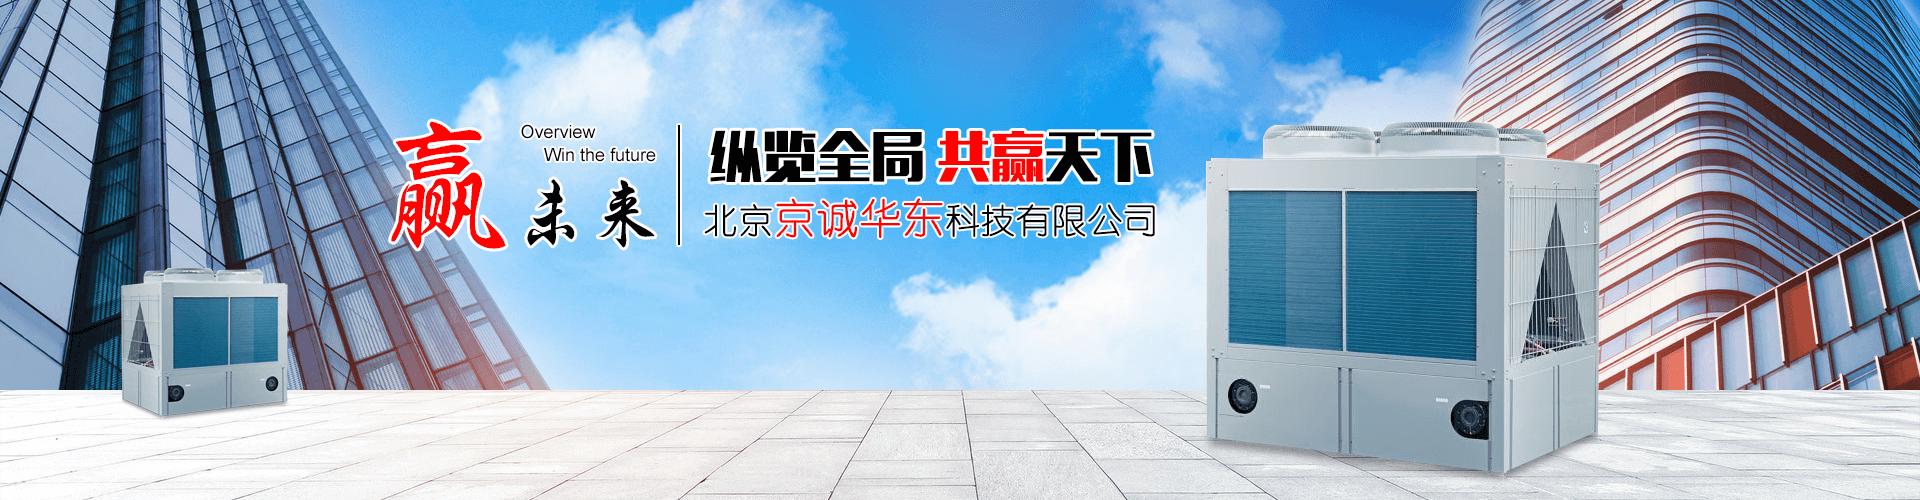 banner01_sp1